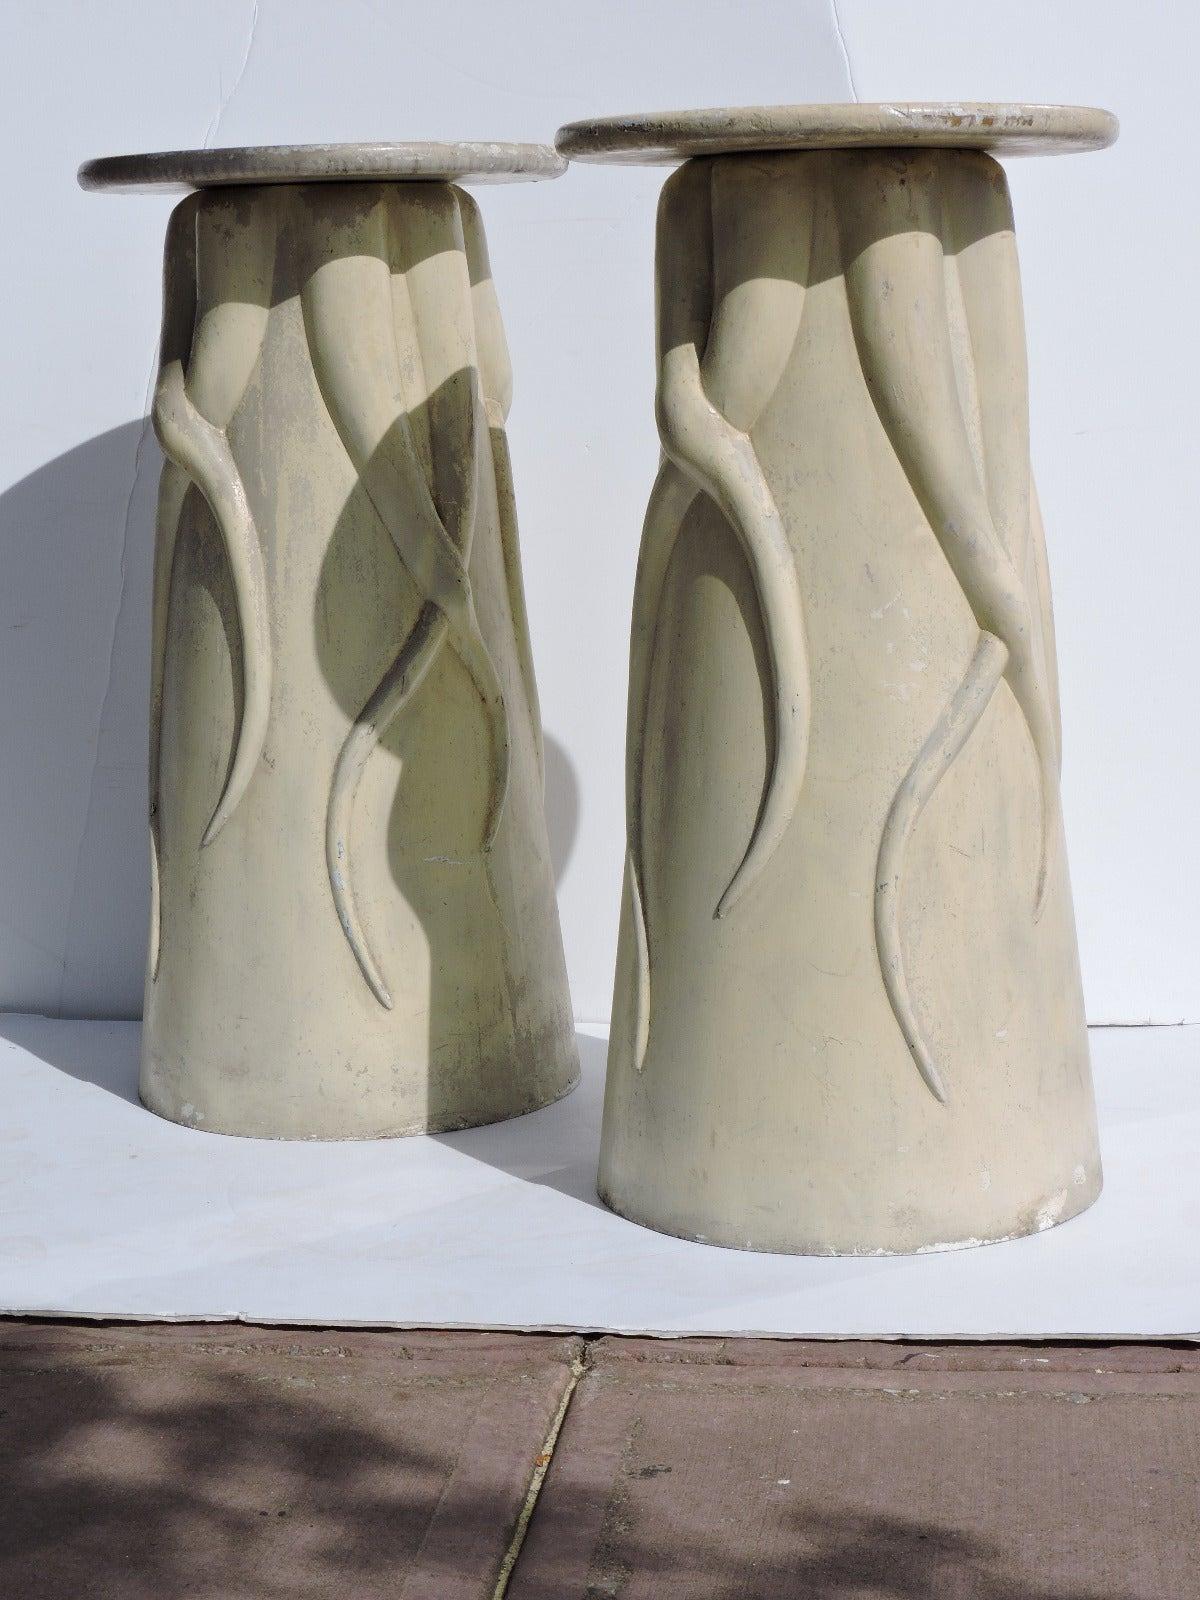 how to make fiberglass sculpture